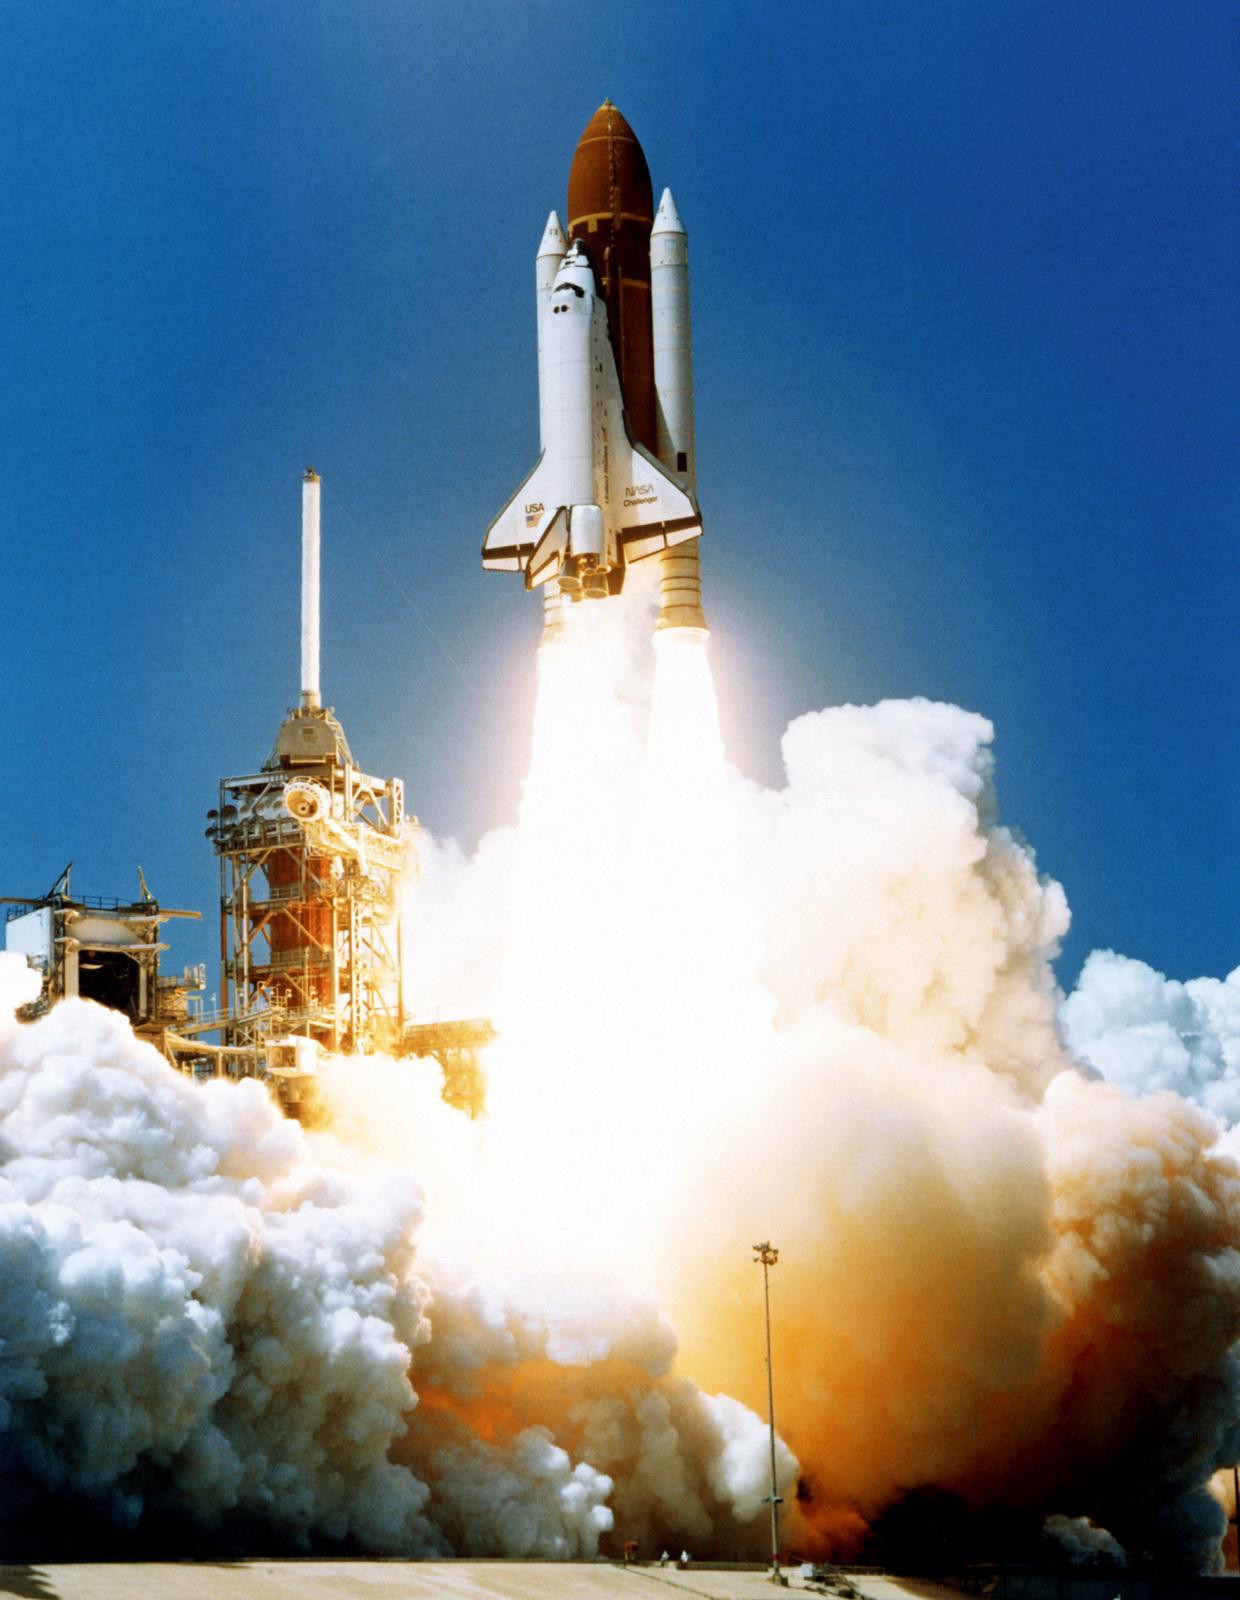 space shuttle challenger - HD1240×1600